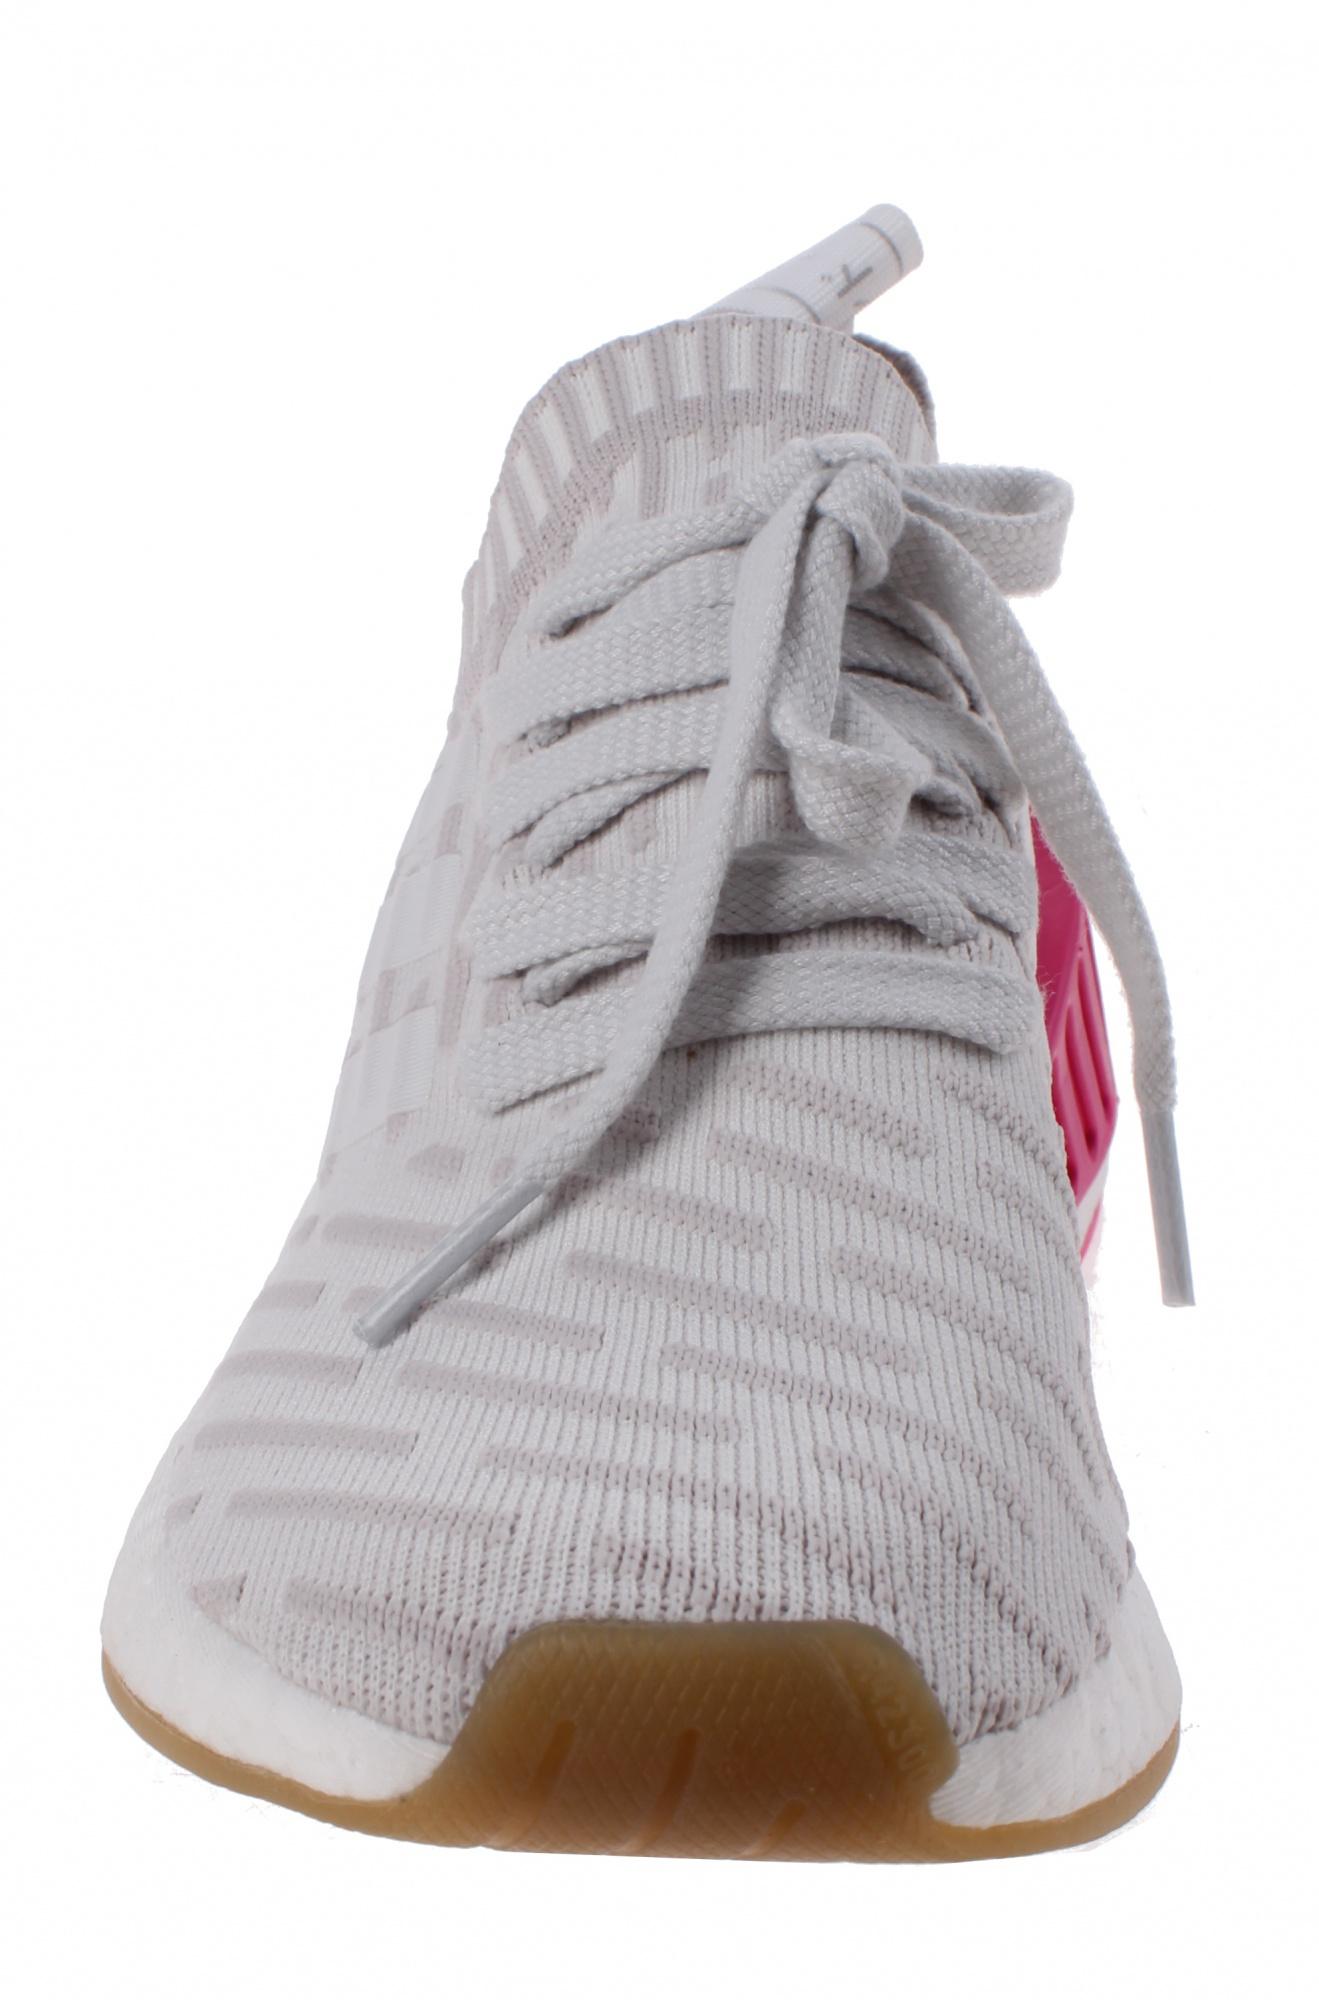 adidas Sneakers NMD R2 Primeknit Damen grau Internet